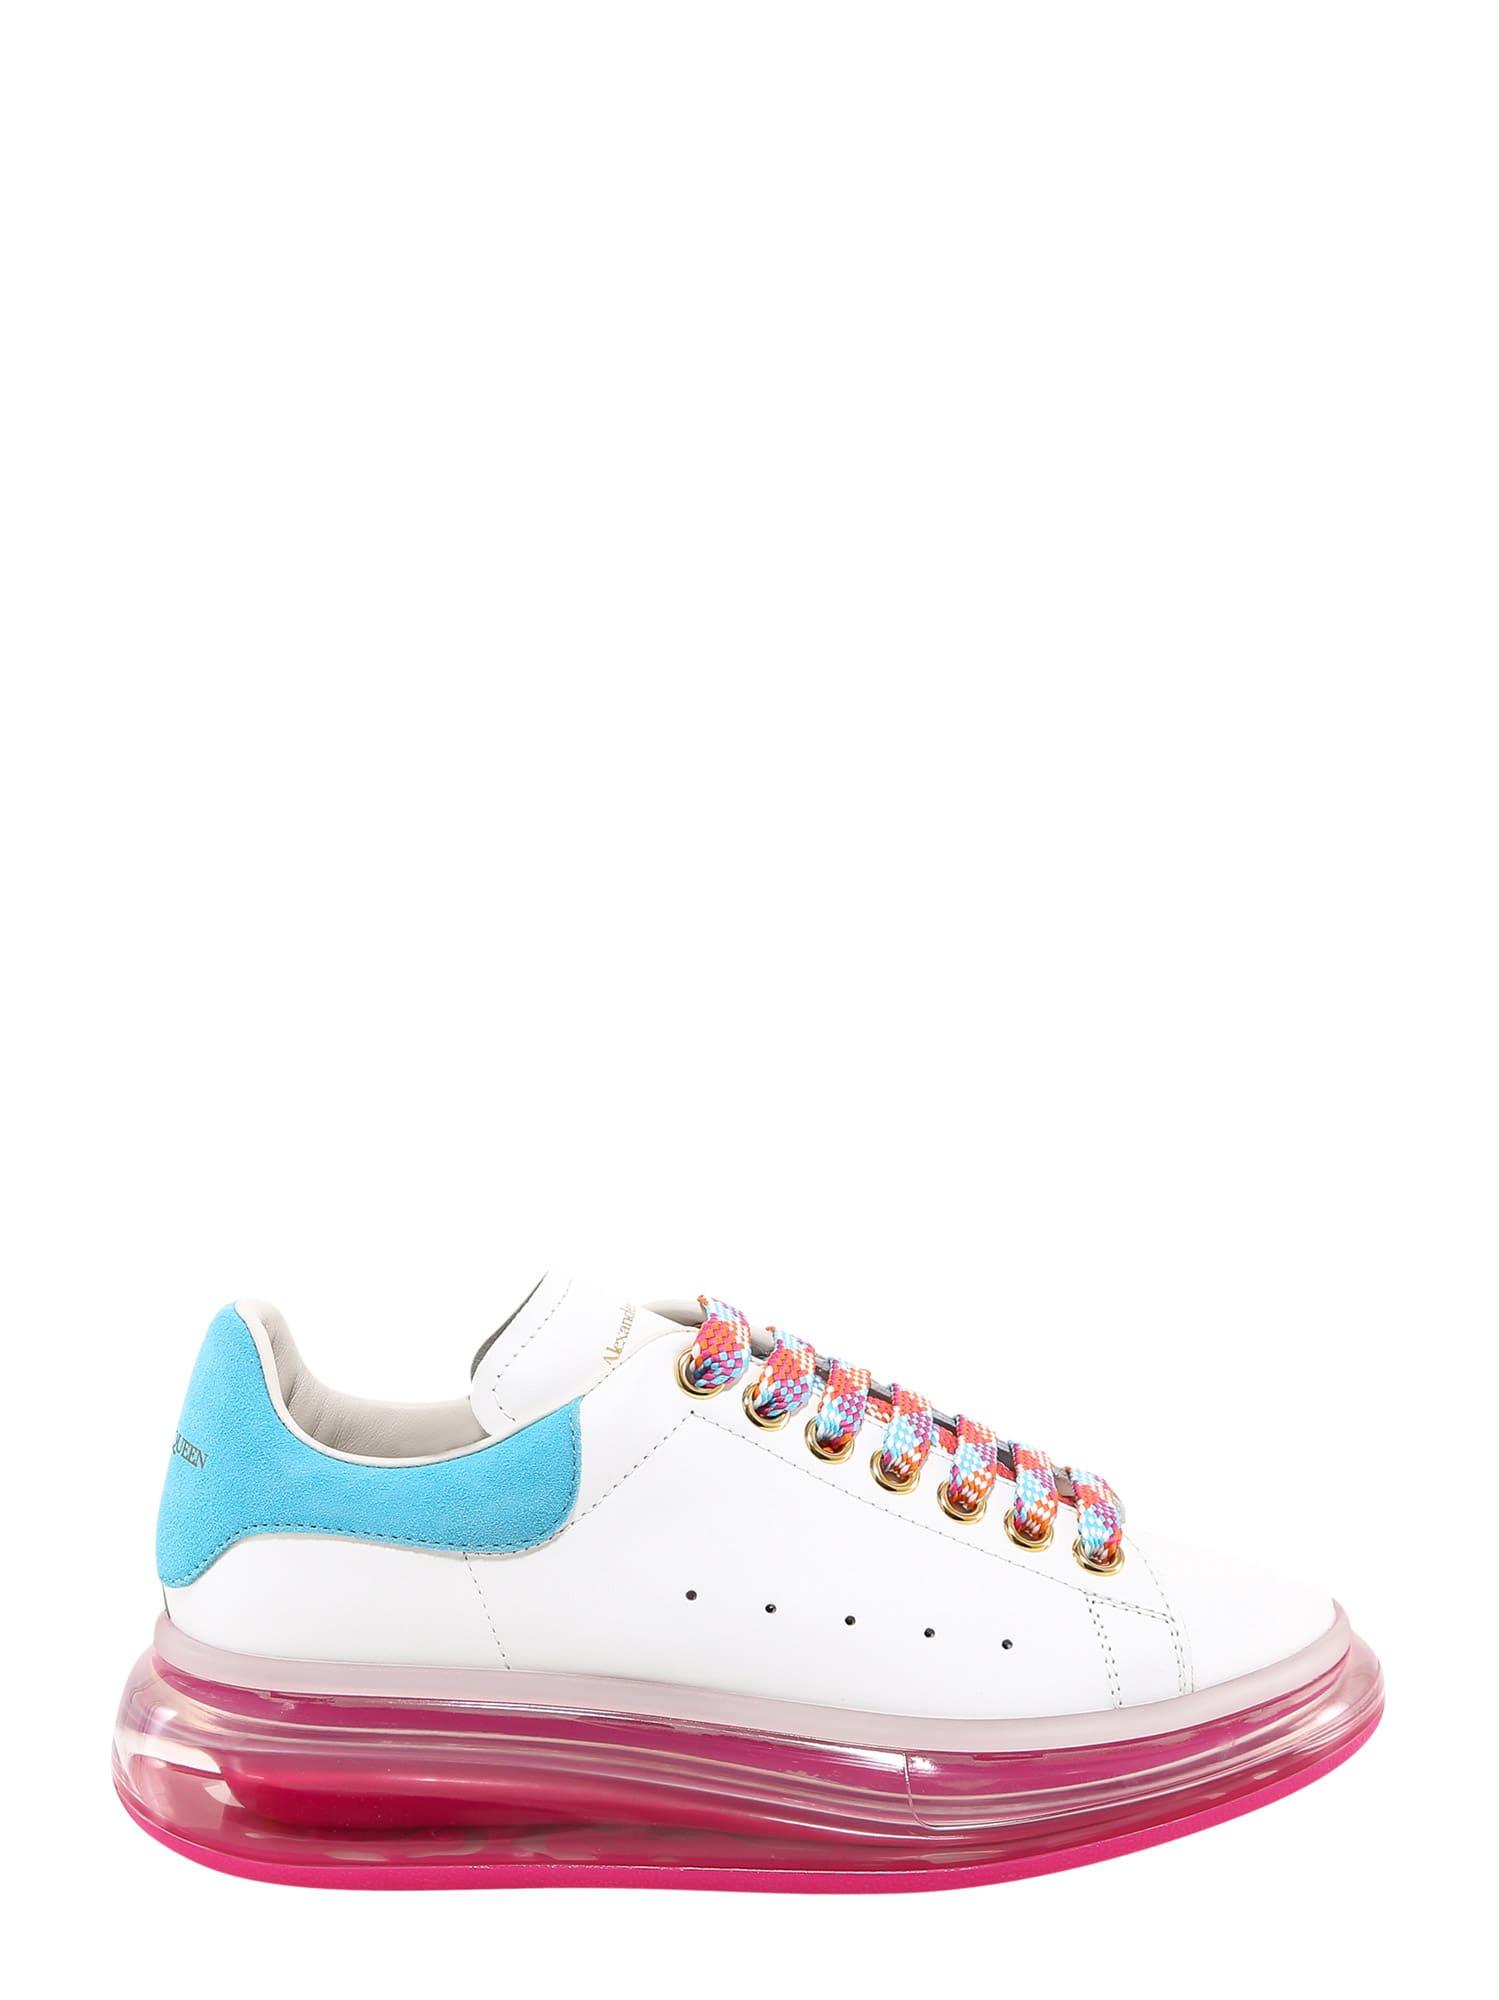 Buy Alexander McQueen Big Sole Sneakers online, shop Alexander McQueen shoes with free shipping